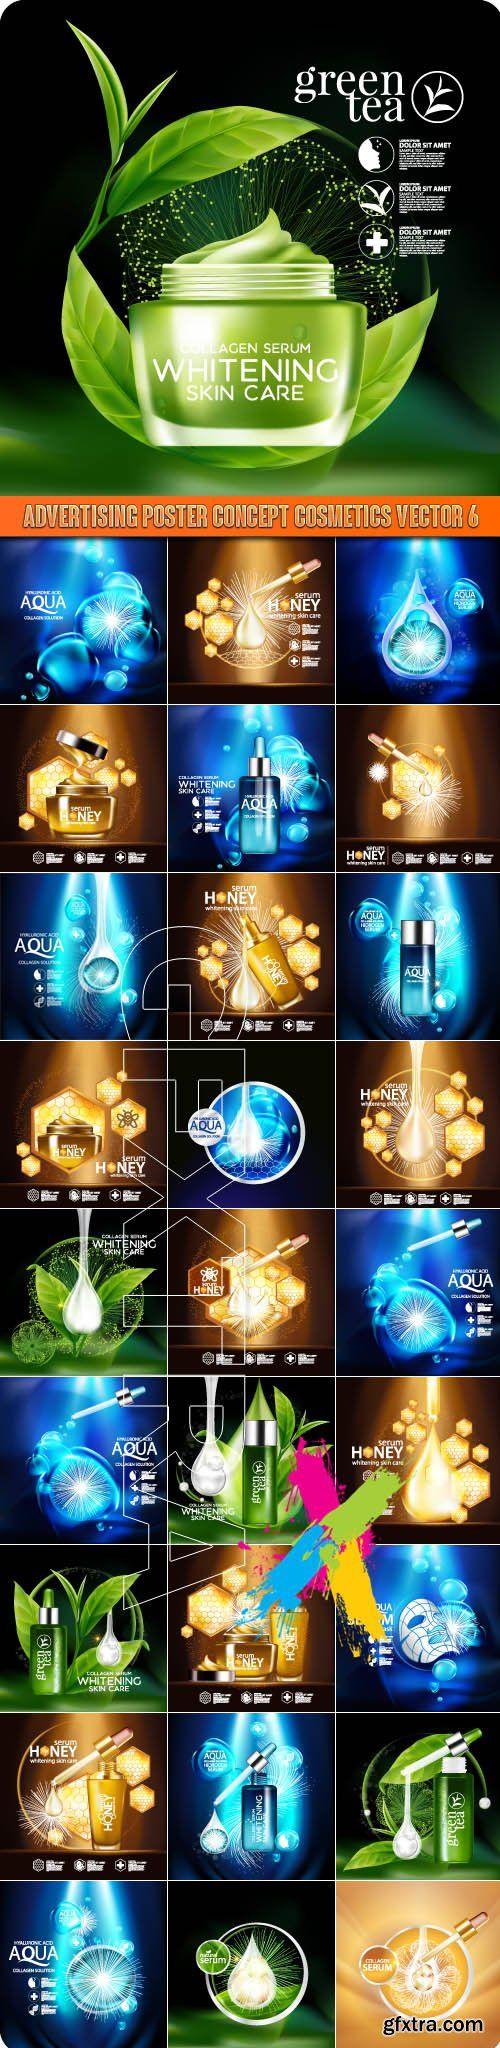 Advertising Poster Concept Cosmetics vector 6 http://webtutorsliv.ml/threads/advertising-poster-concept-cosmetics-vector-6.45559/